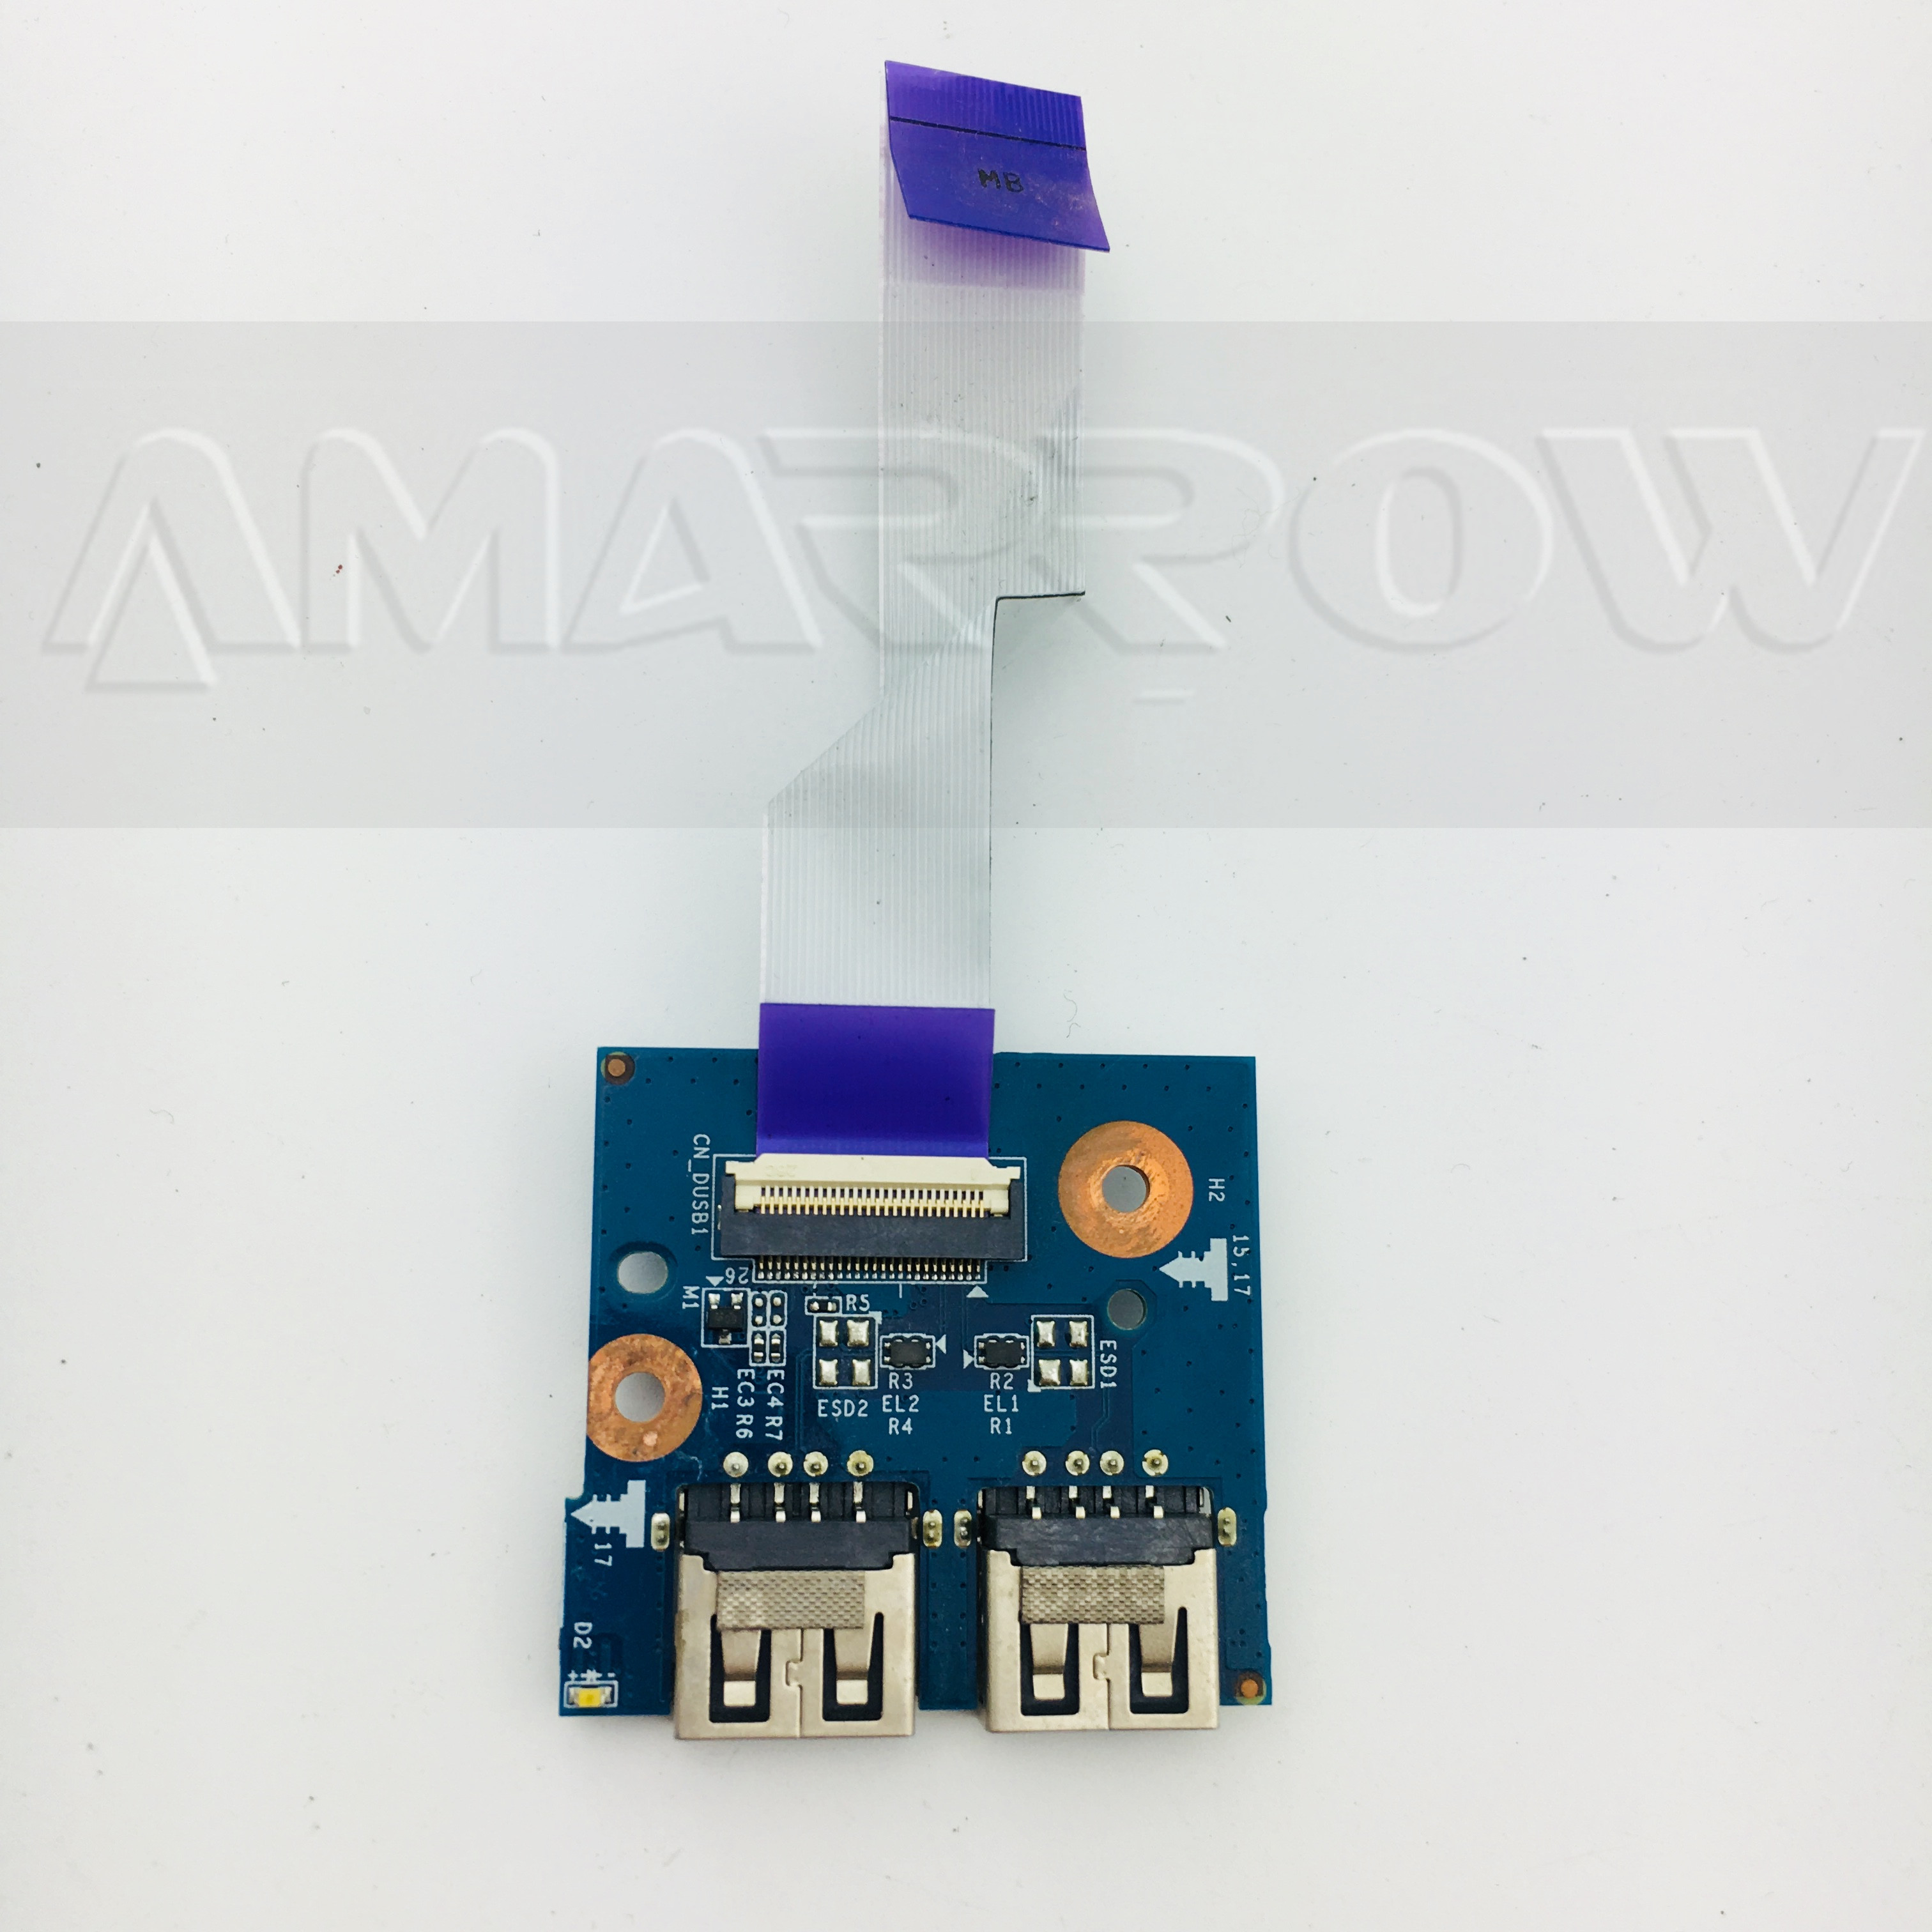 Original Free Shipping For HP DV6-6000 DV6 DV7-6000 DV7 USB Board 40GAB630S 40GAB670S